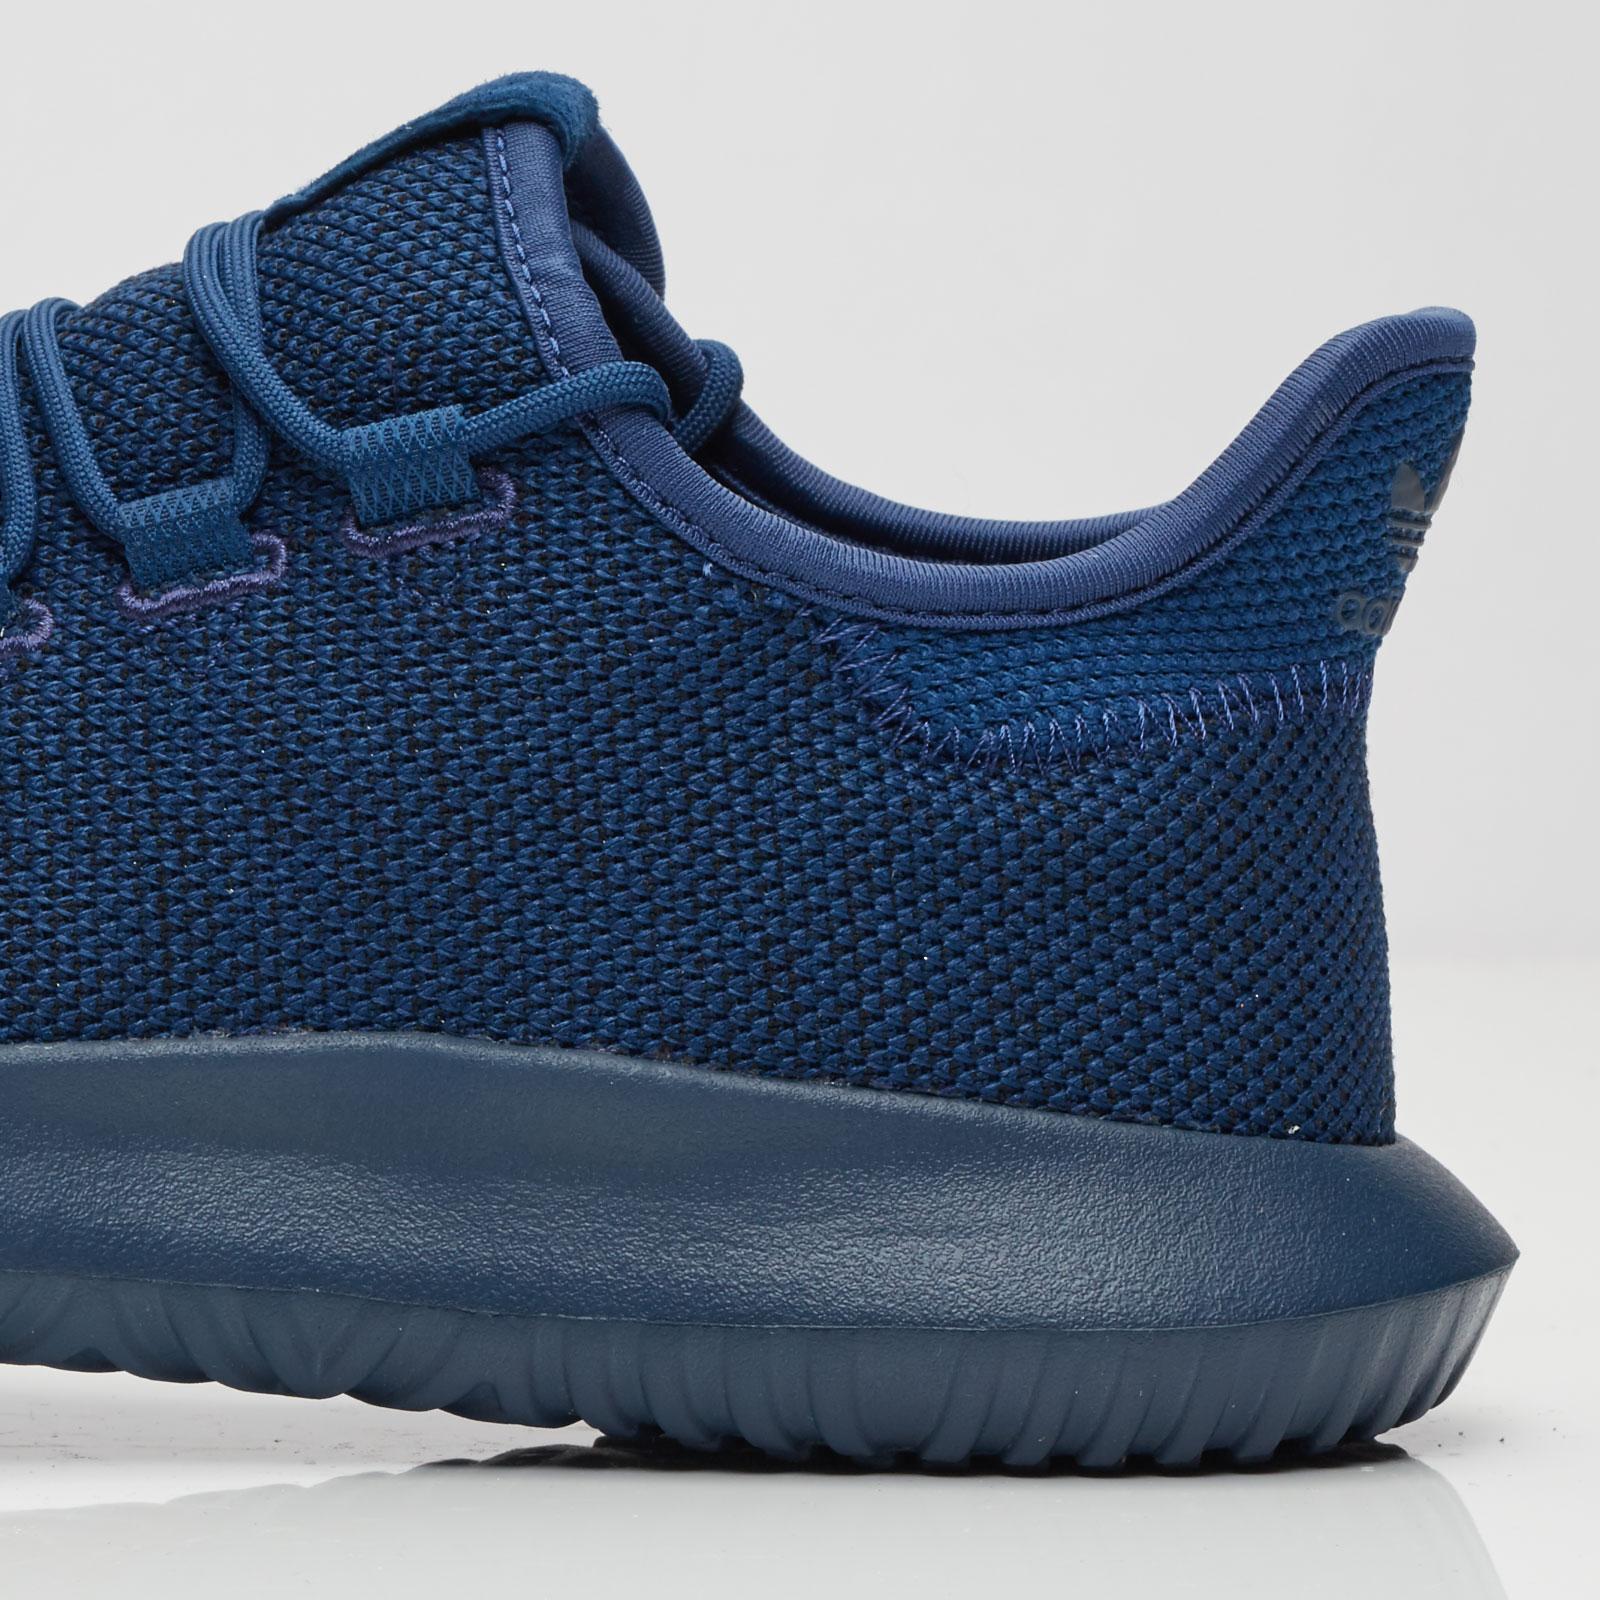 brand new d4933 ac1ed adidas Tubular Shadow Knit - Bb8825 - Sneakersnstuff   sneakers    streetwear online since 1999